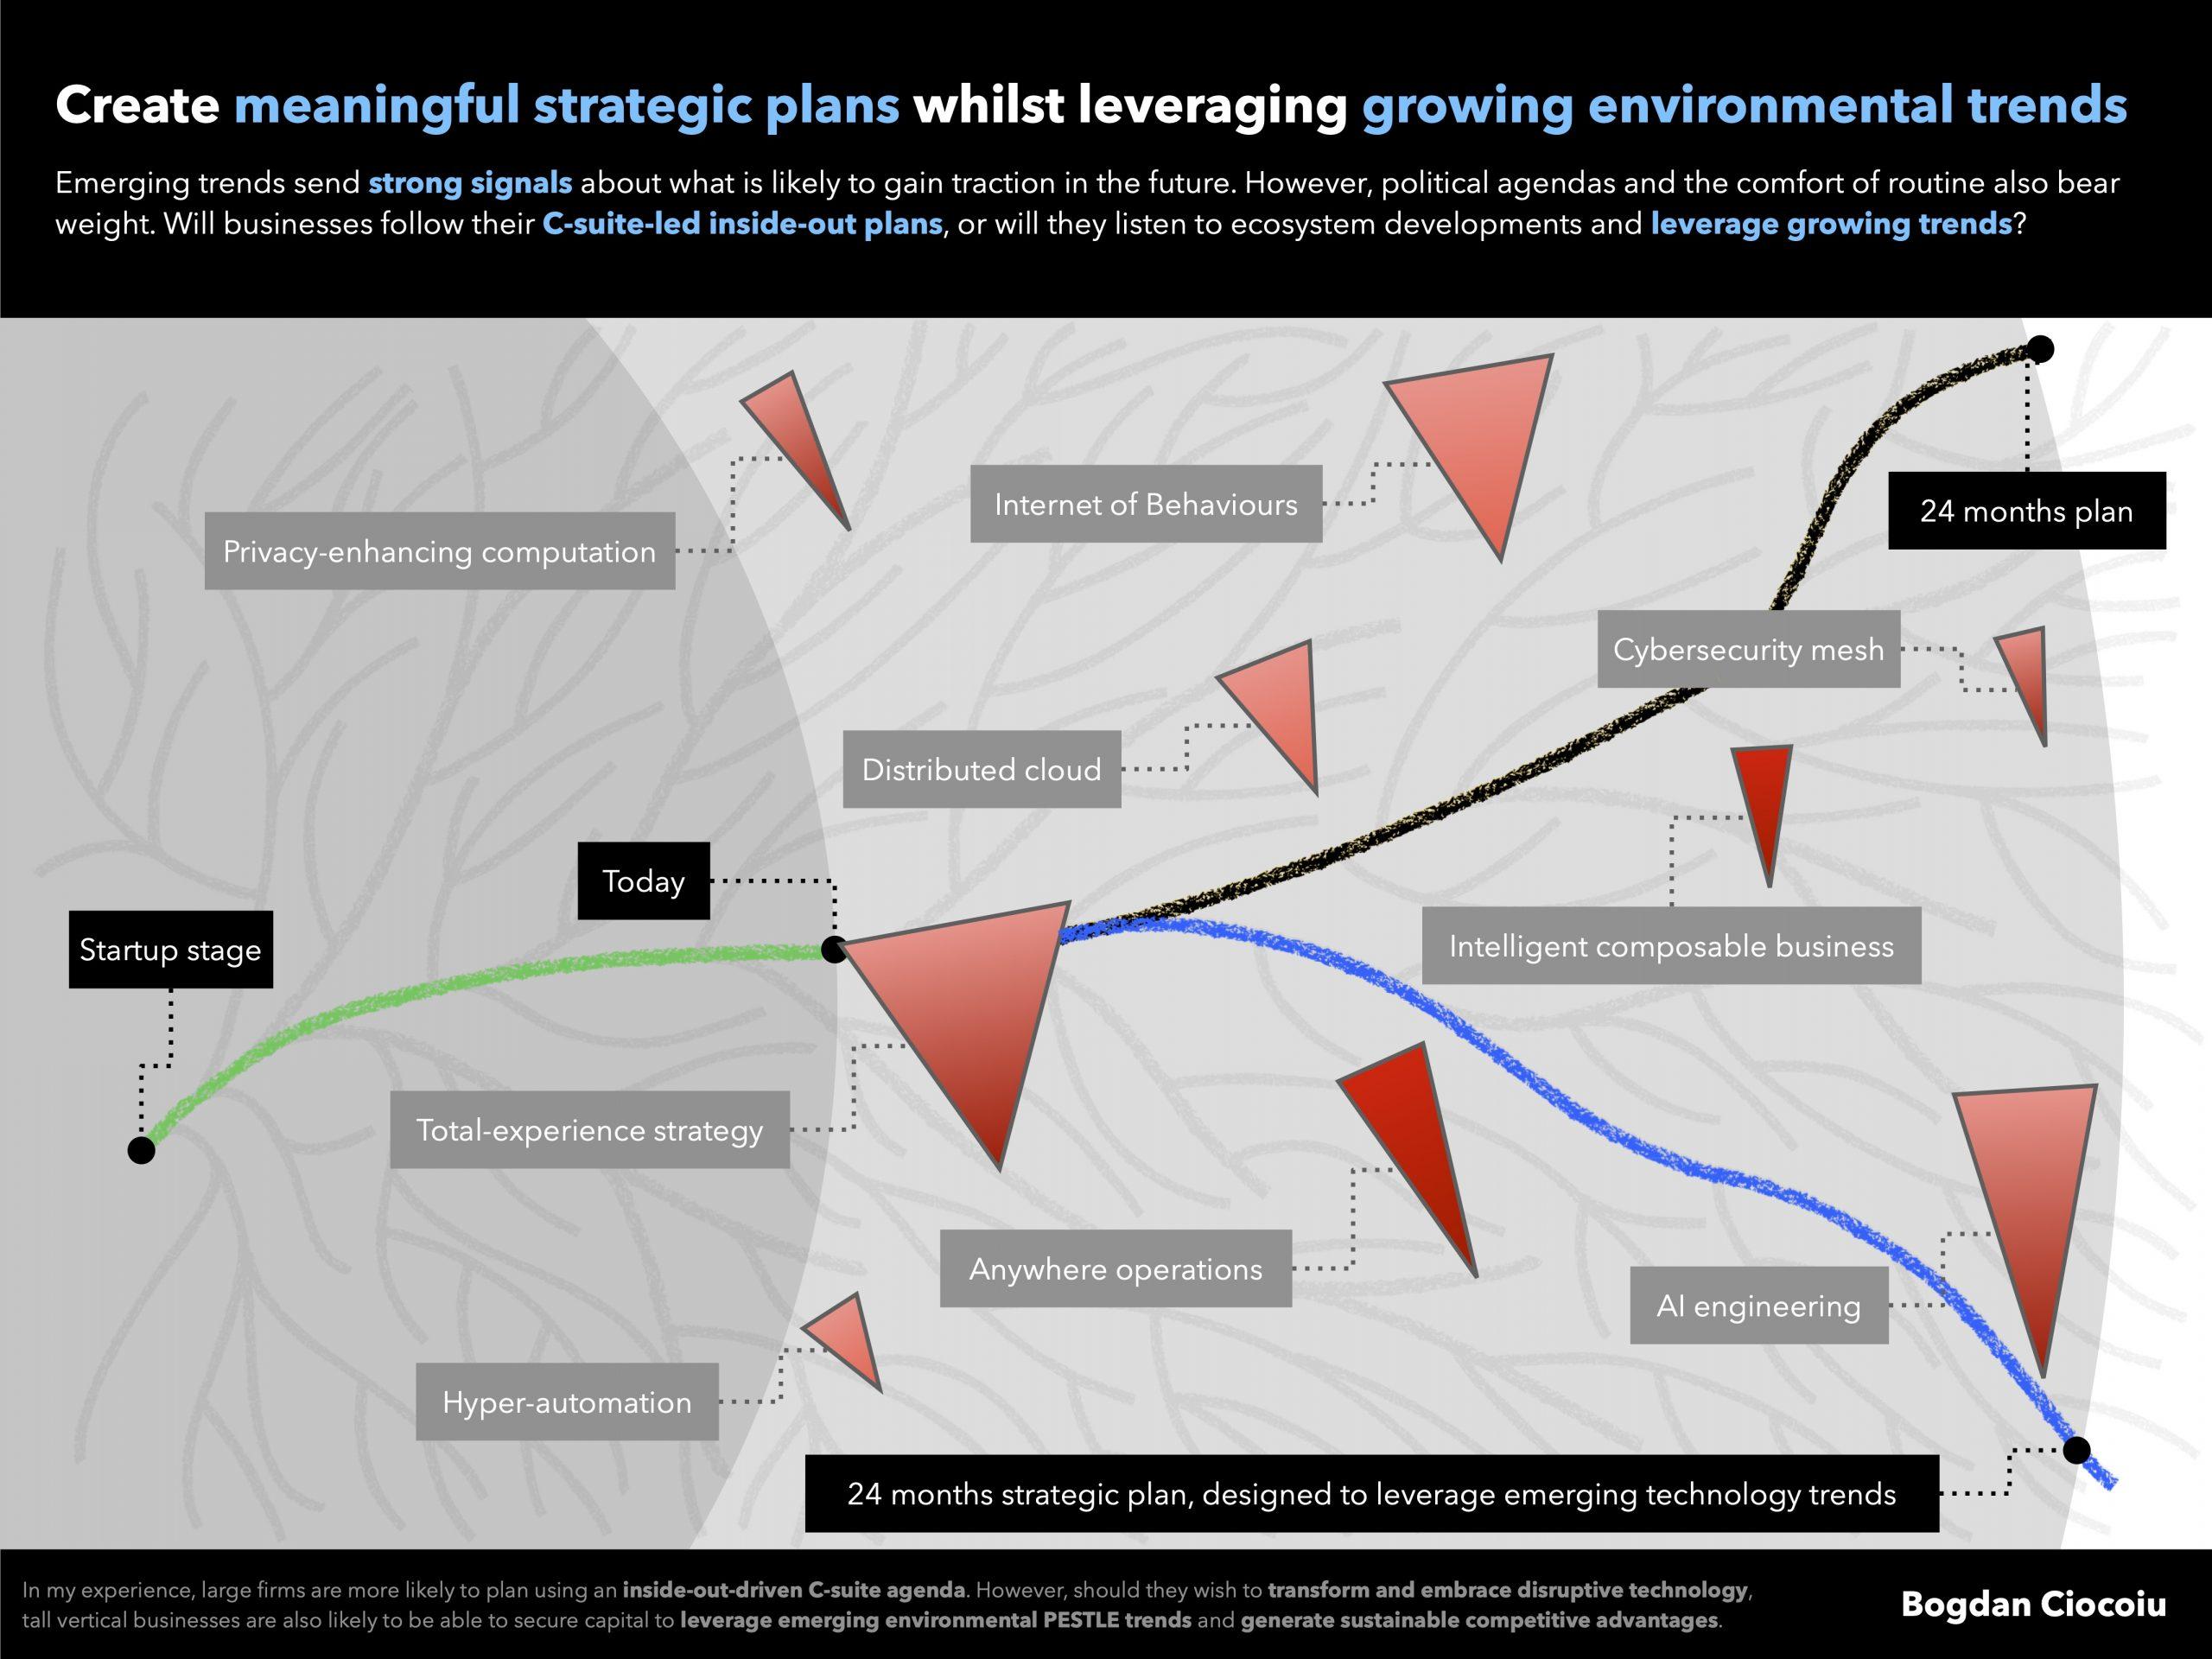 Leverage growing environmental trends - Bogdan Ciocoiu